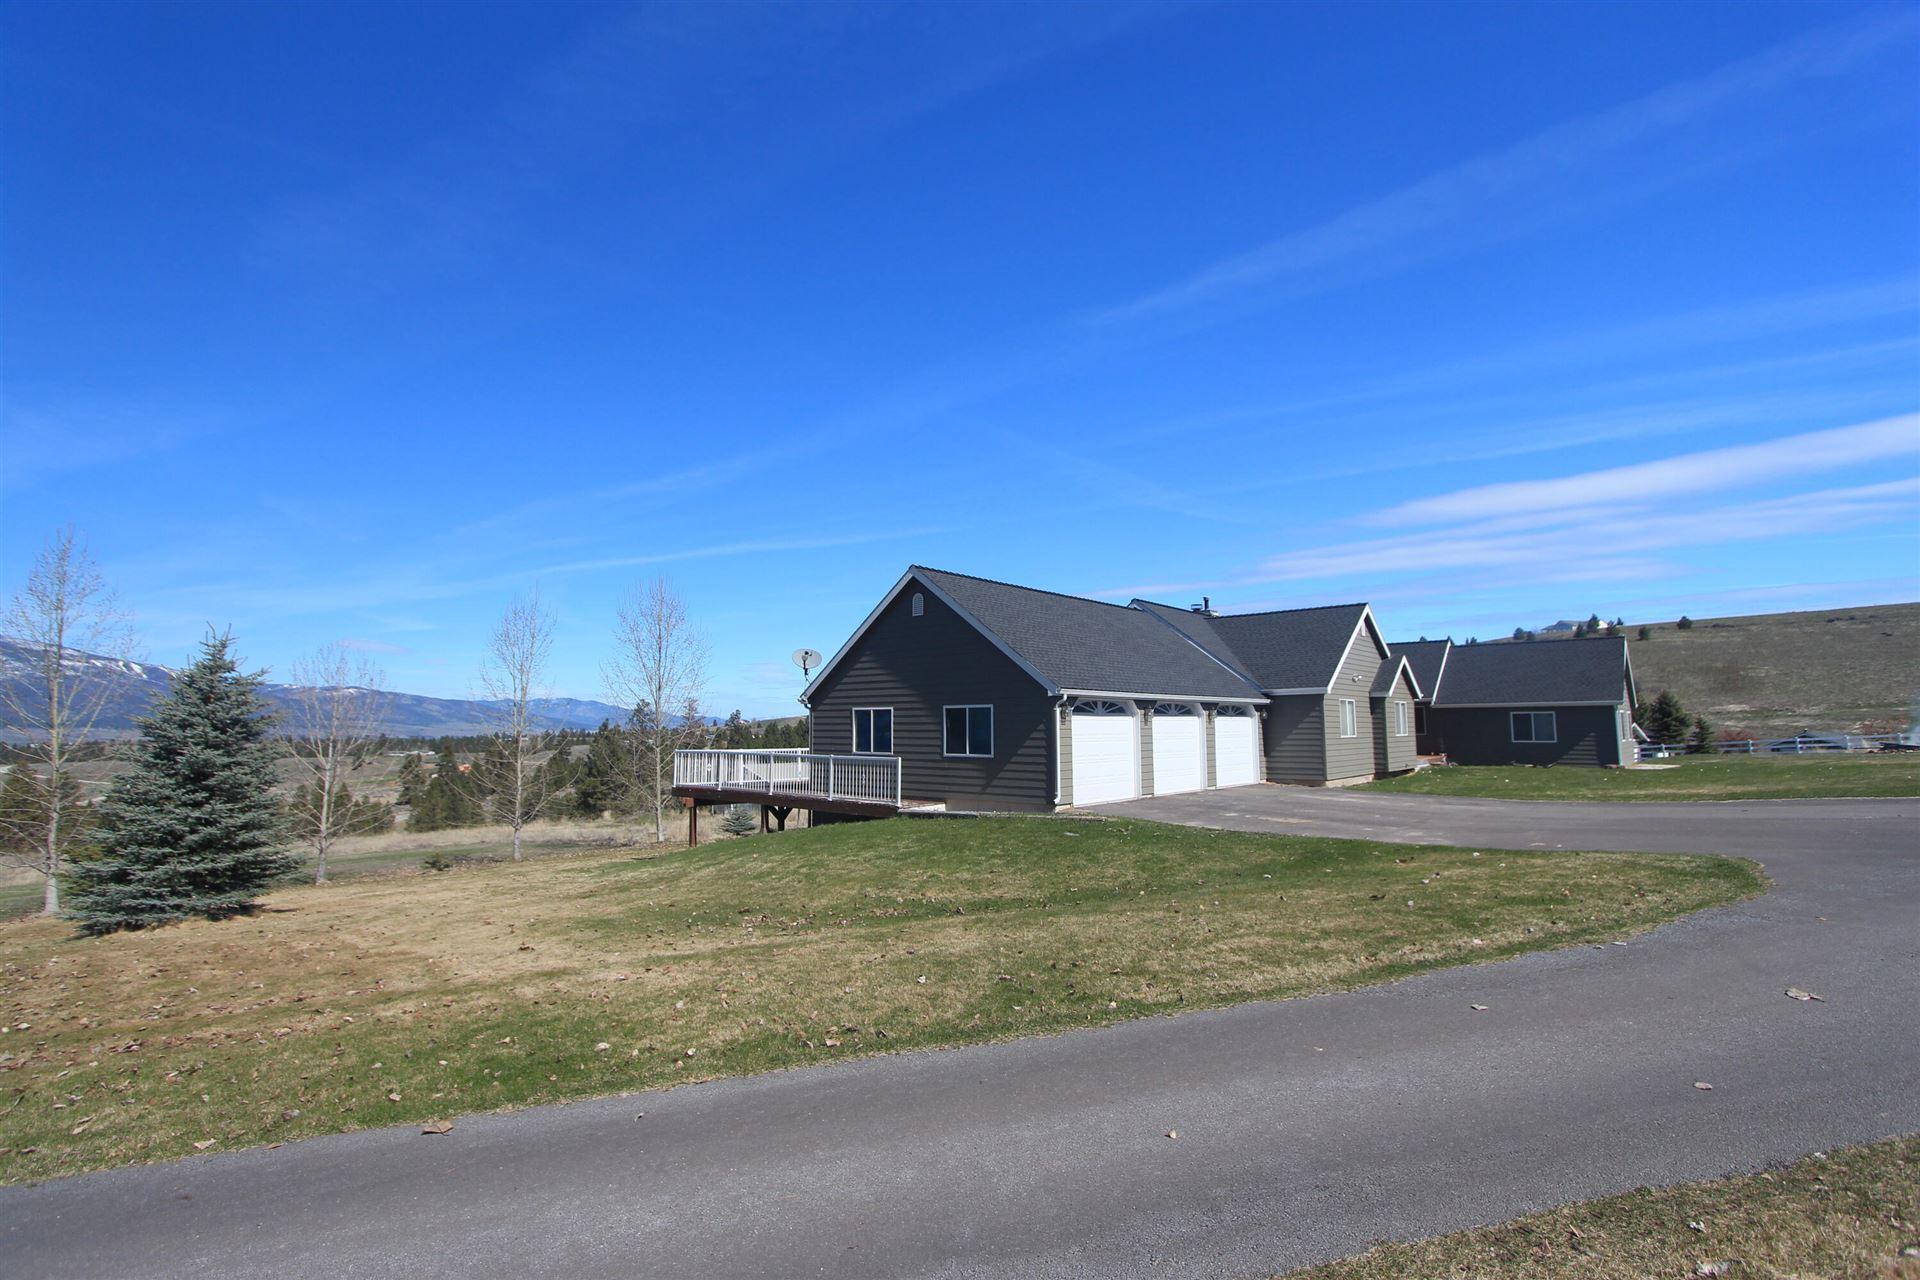 Photo of 468 Wheatgrass Road, Stevensville, MT 59870 (MLS # 22114699)